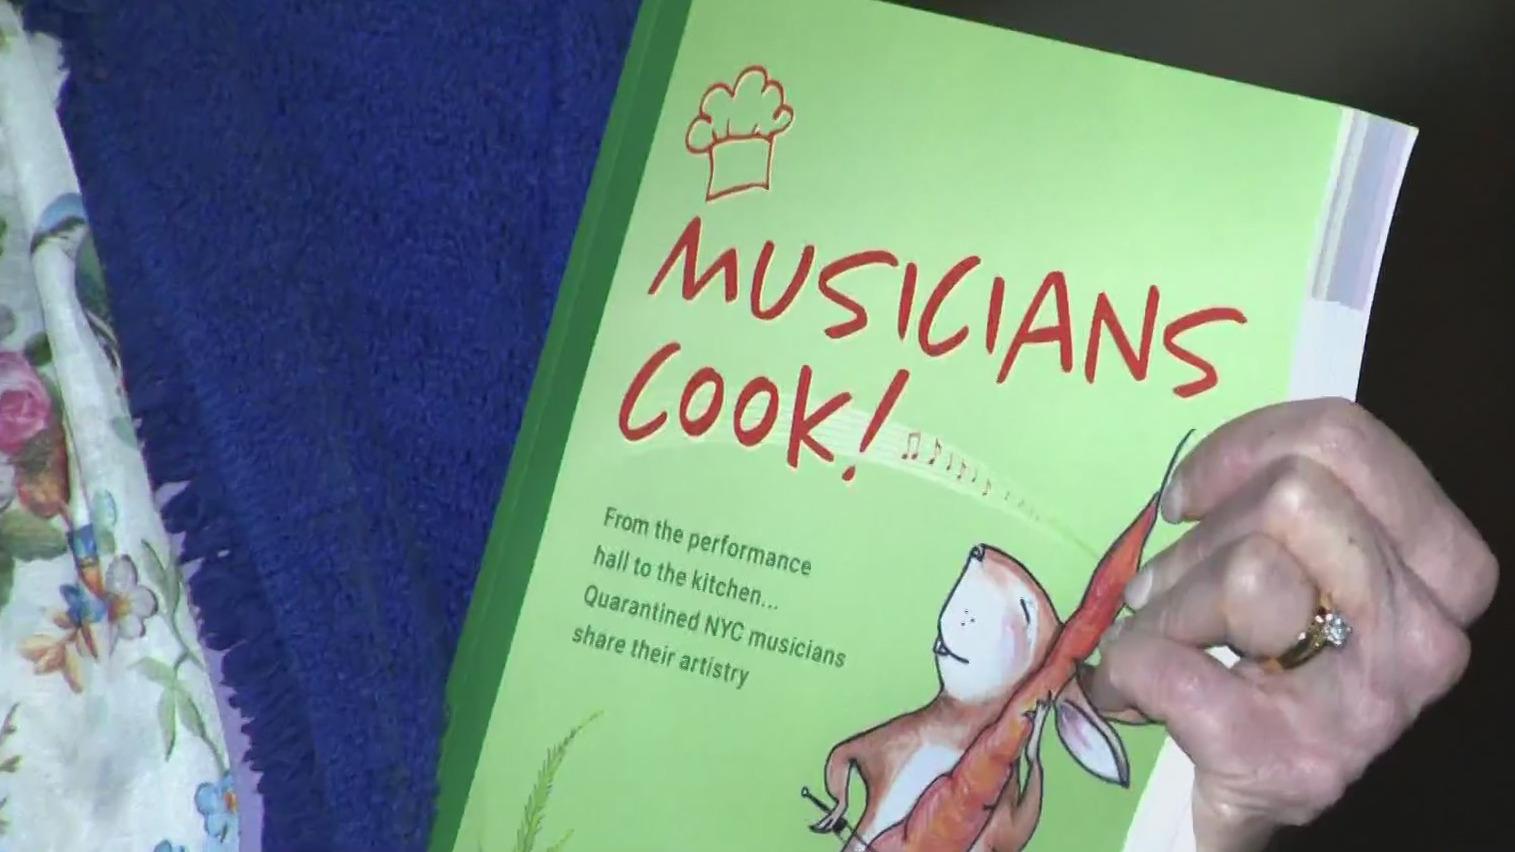 Musicians cook cookbook